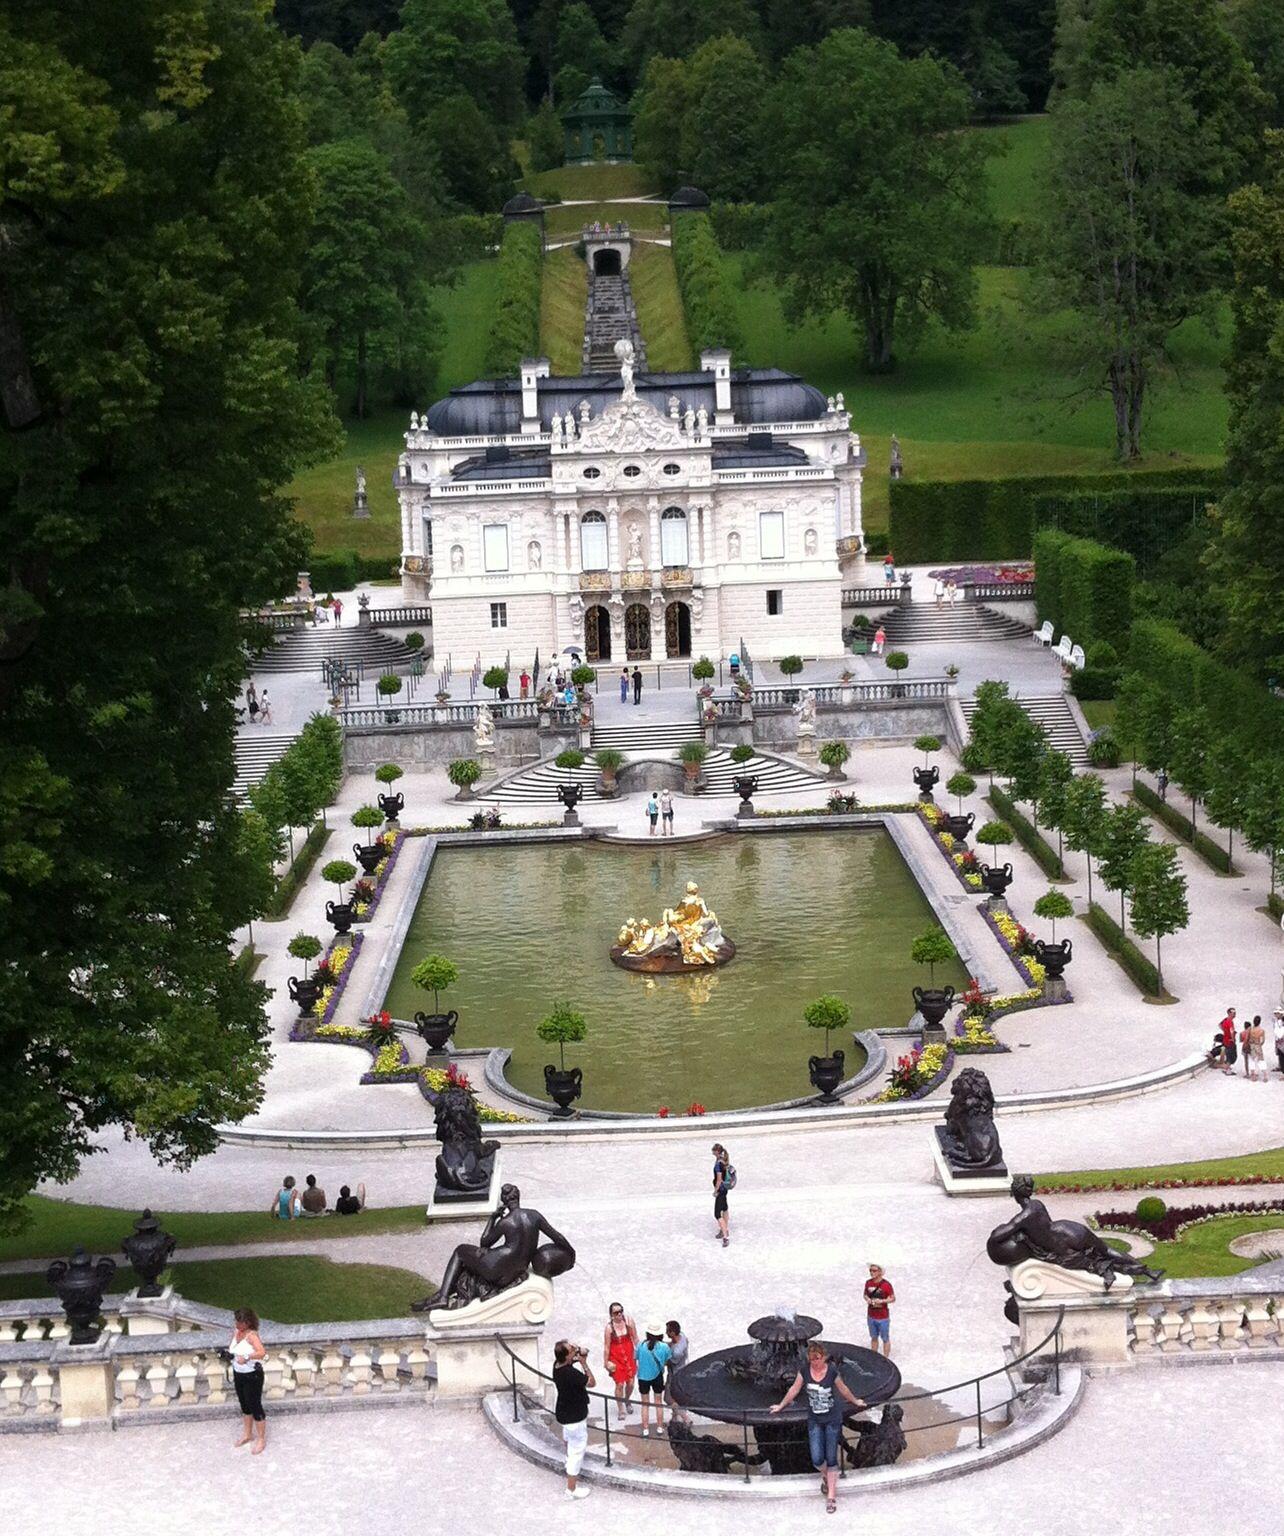 Schloss Linderhof In Ettal Germany Con Immagini Viaggi